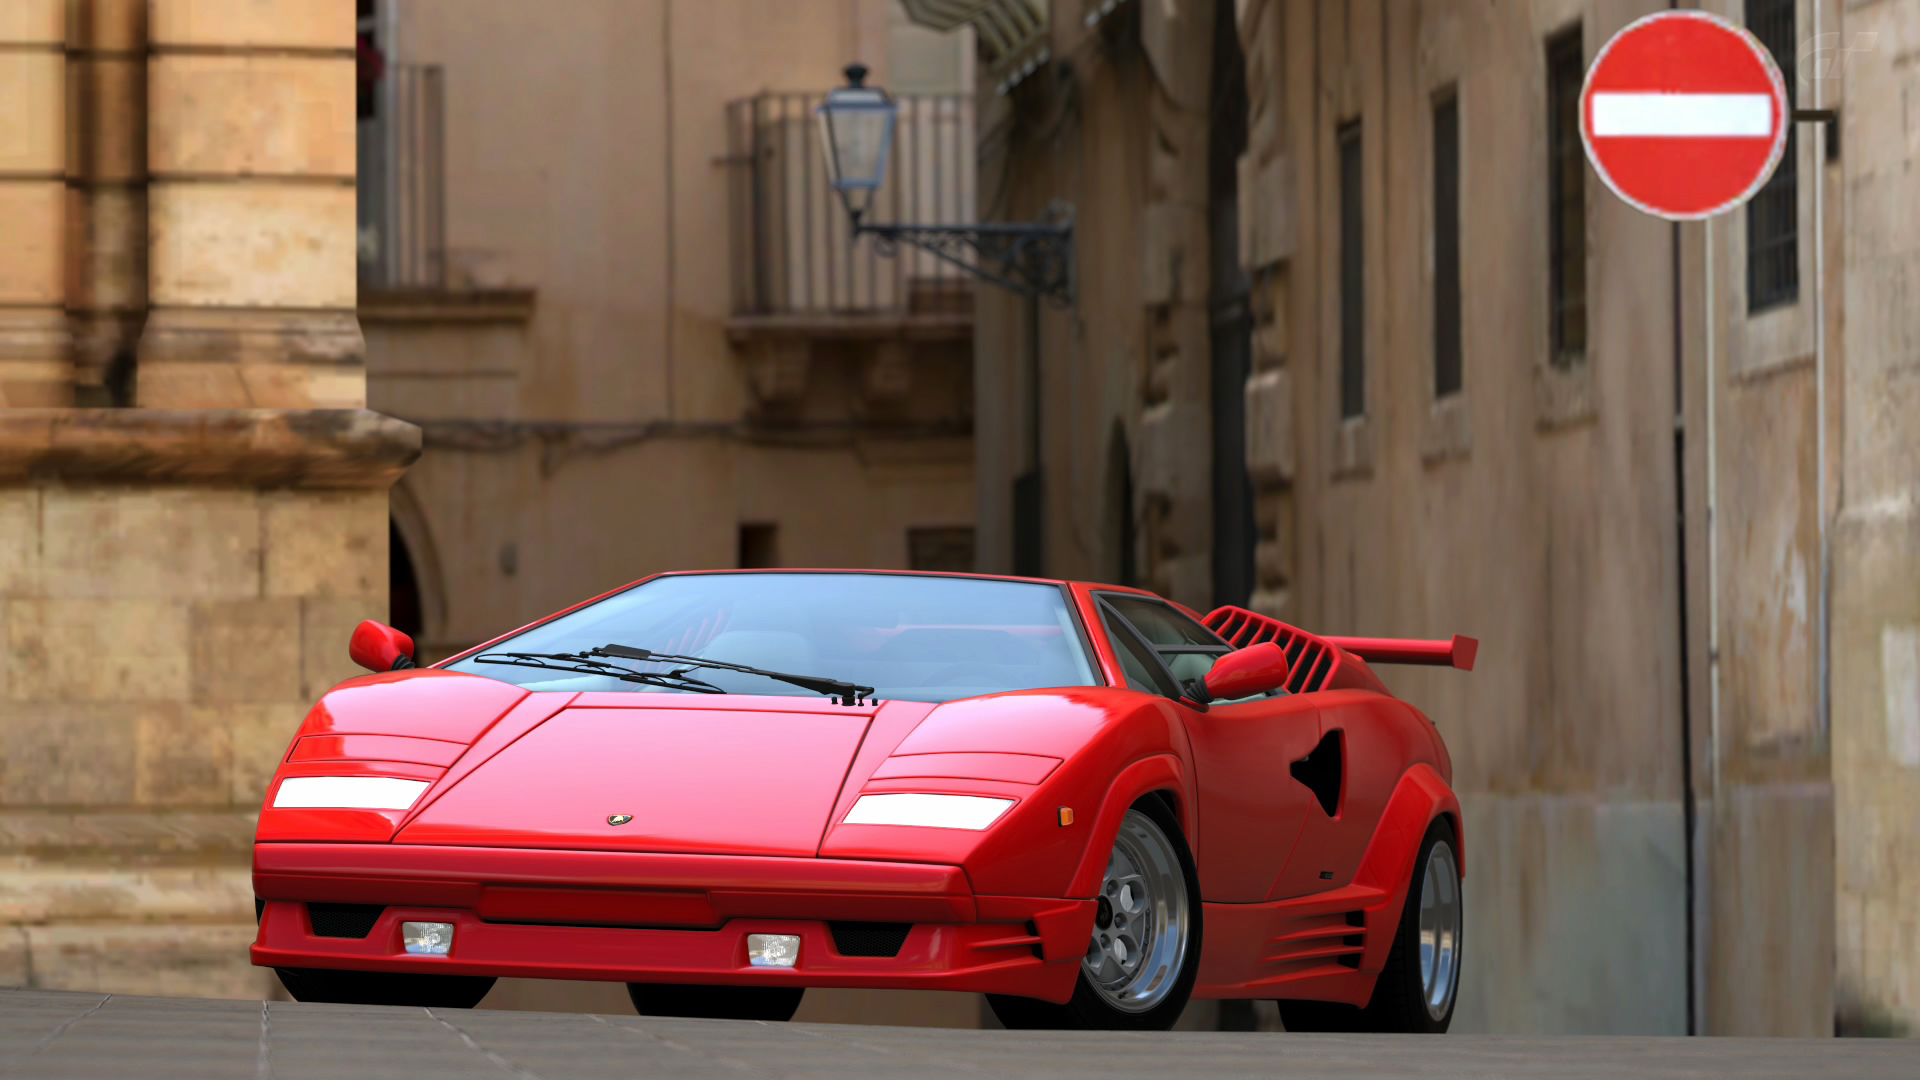 lamborghini_countach_25th_anniversary__gt6__by_vertualissimo-d774rvl Elegant Lamborghini Countach 25th Anniversary Specs Cars Trend